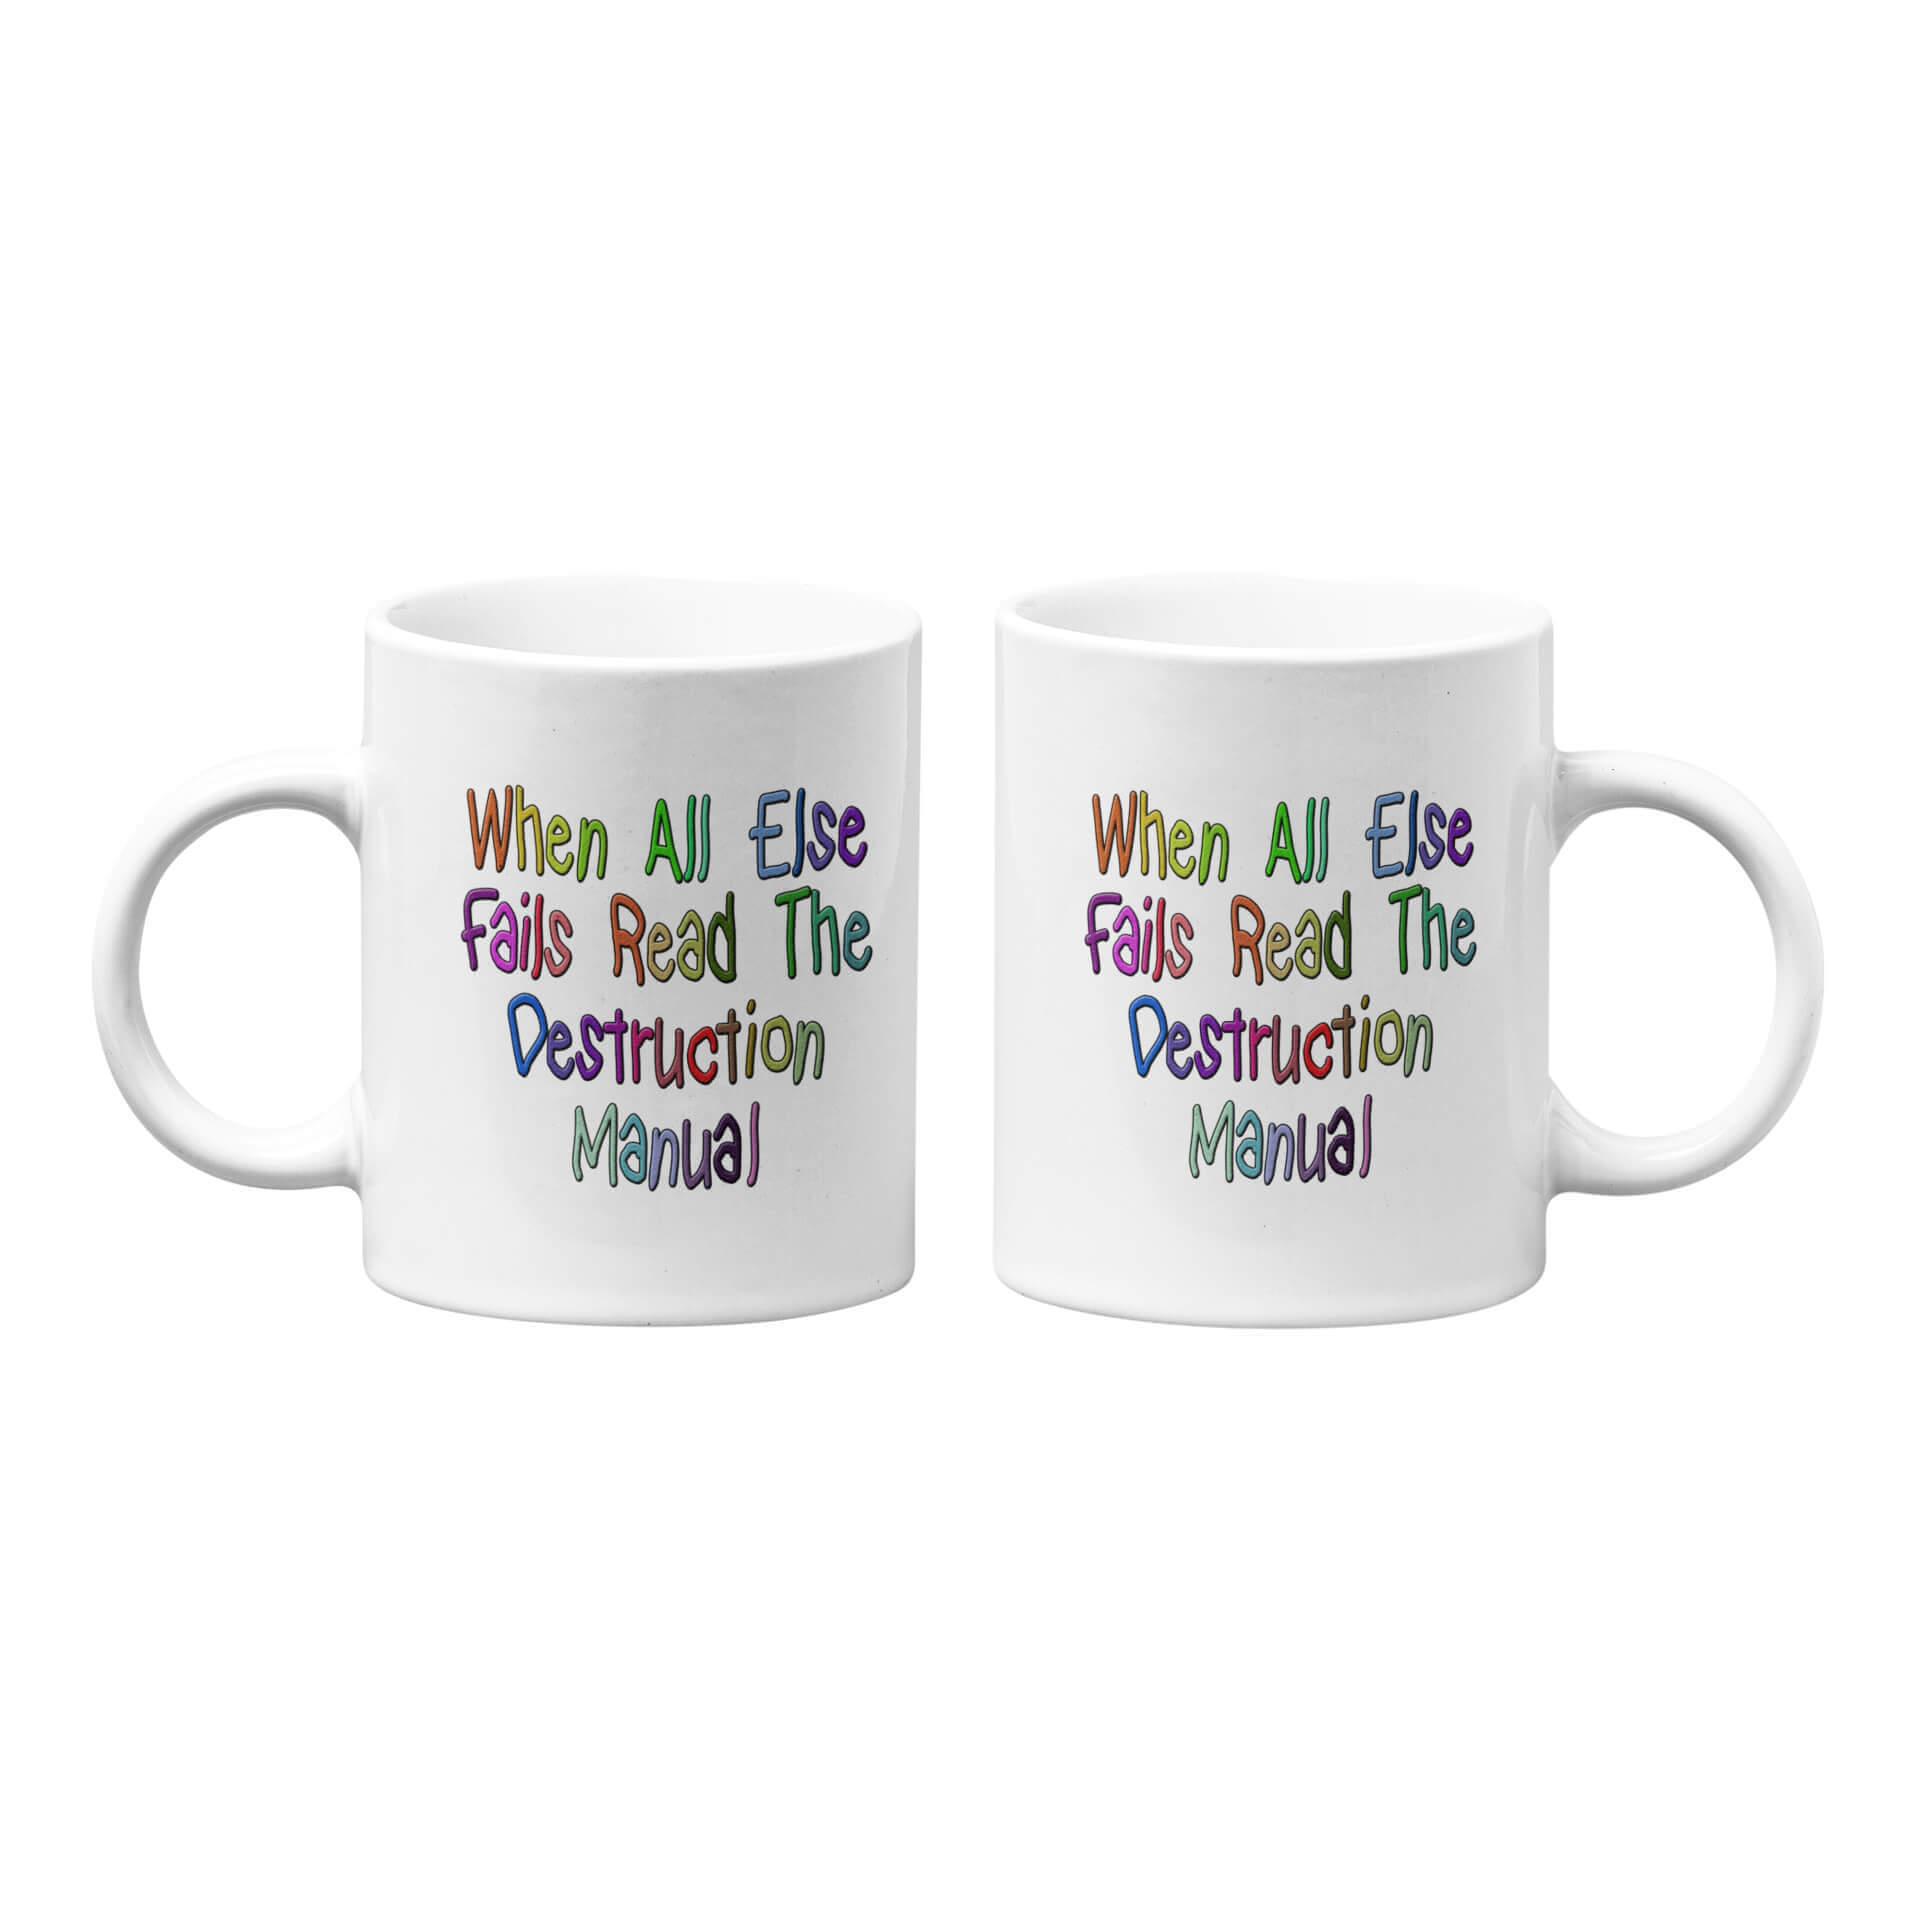 When All Else Fails Read The Destruction Manual Mug